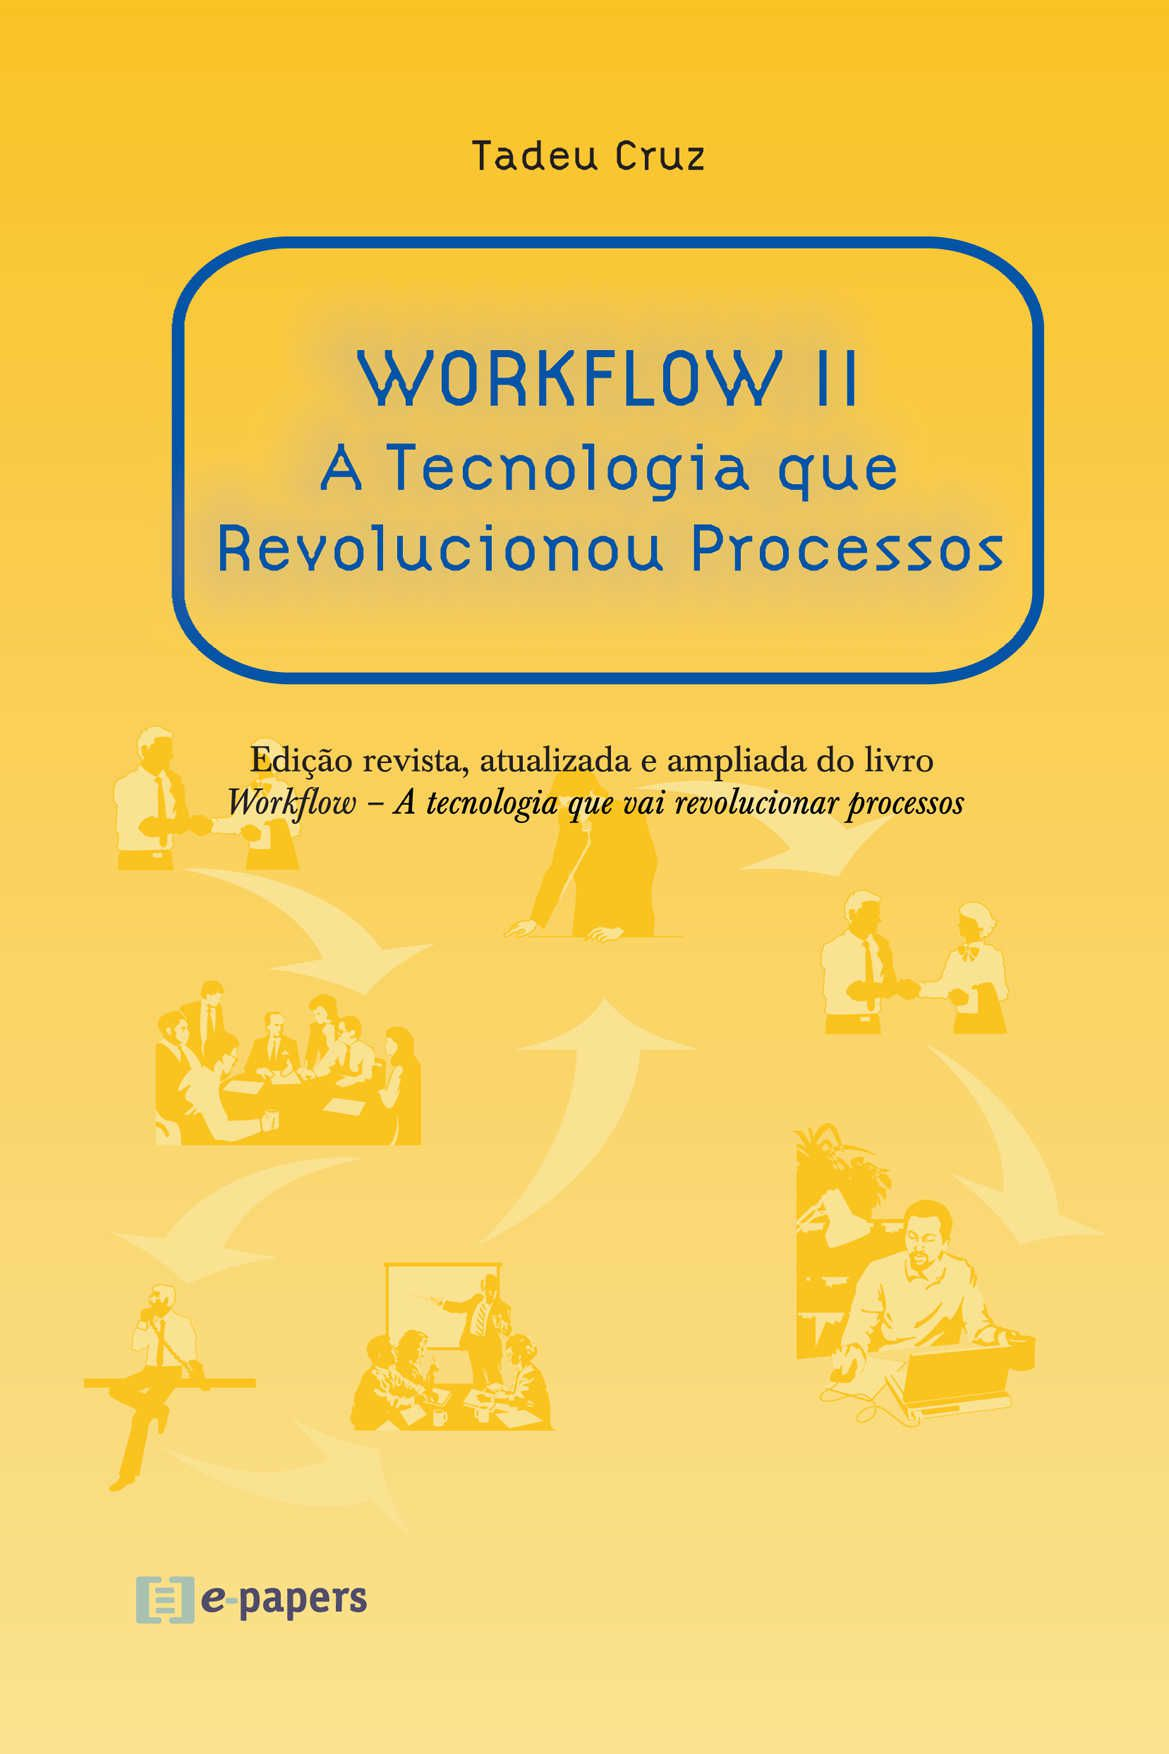 Workflow II: A Tecnologia que Revolucionou Processos